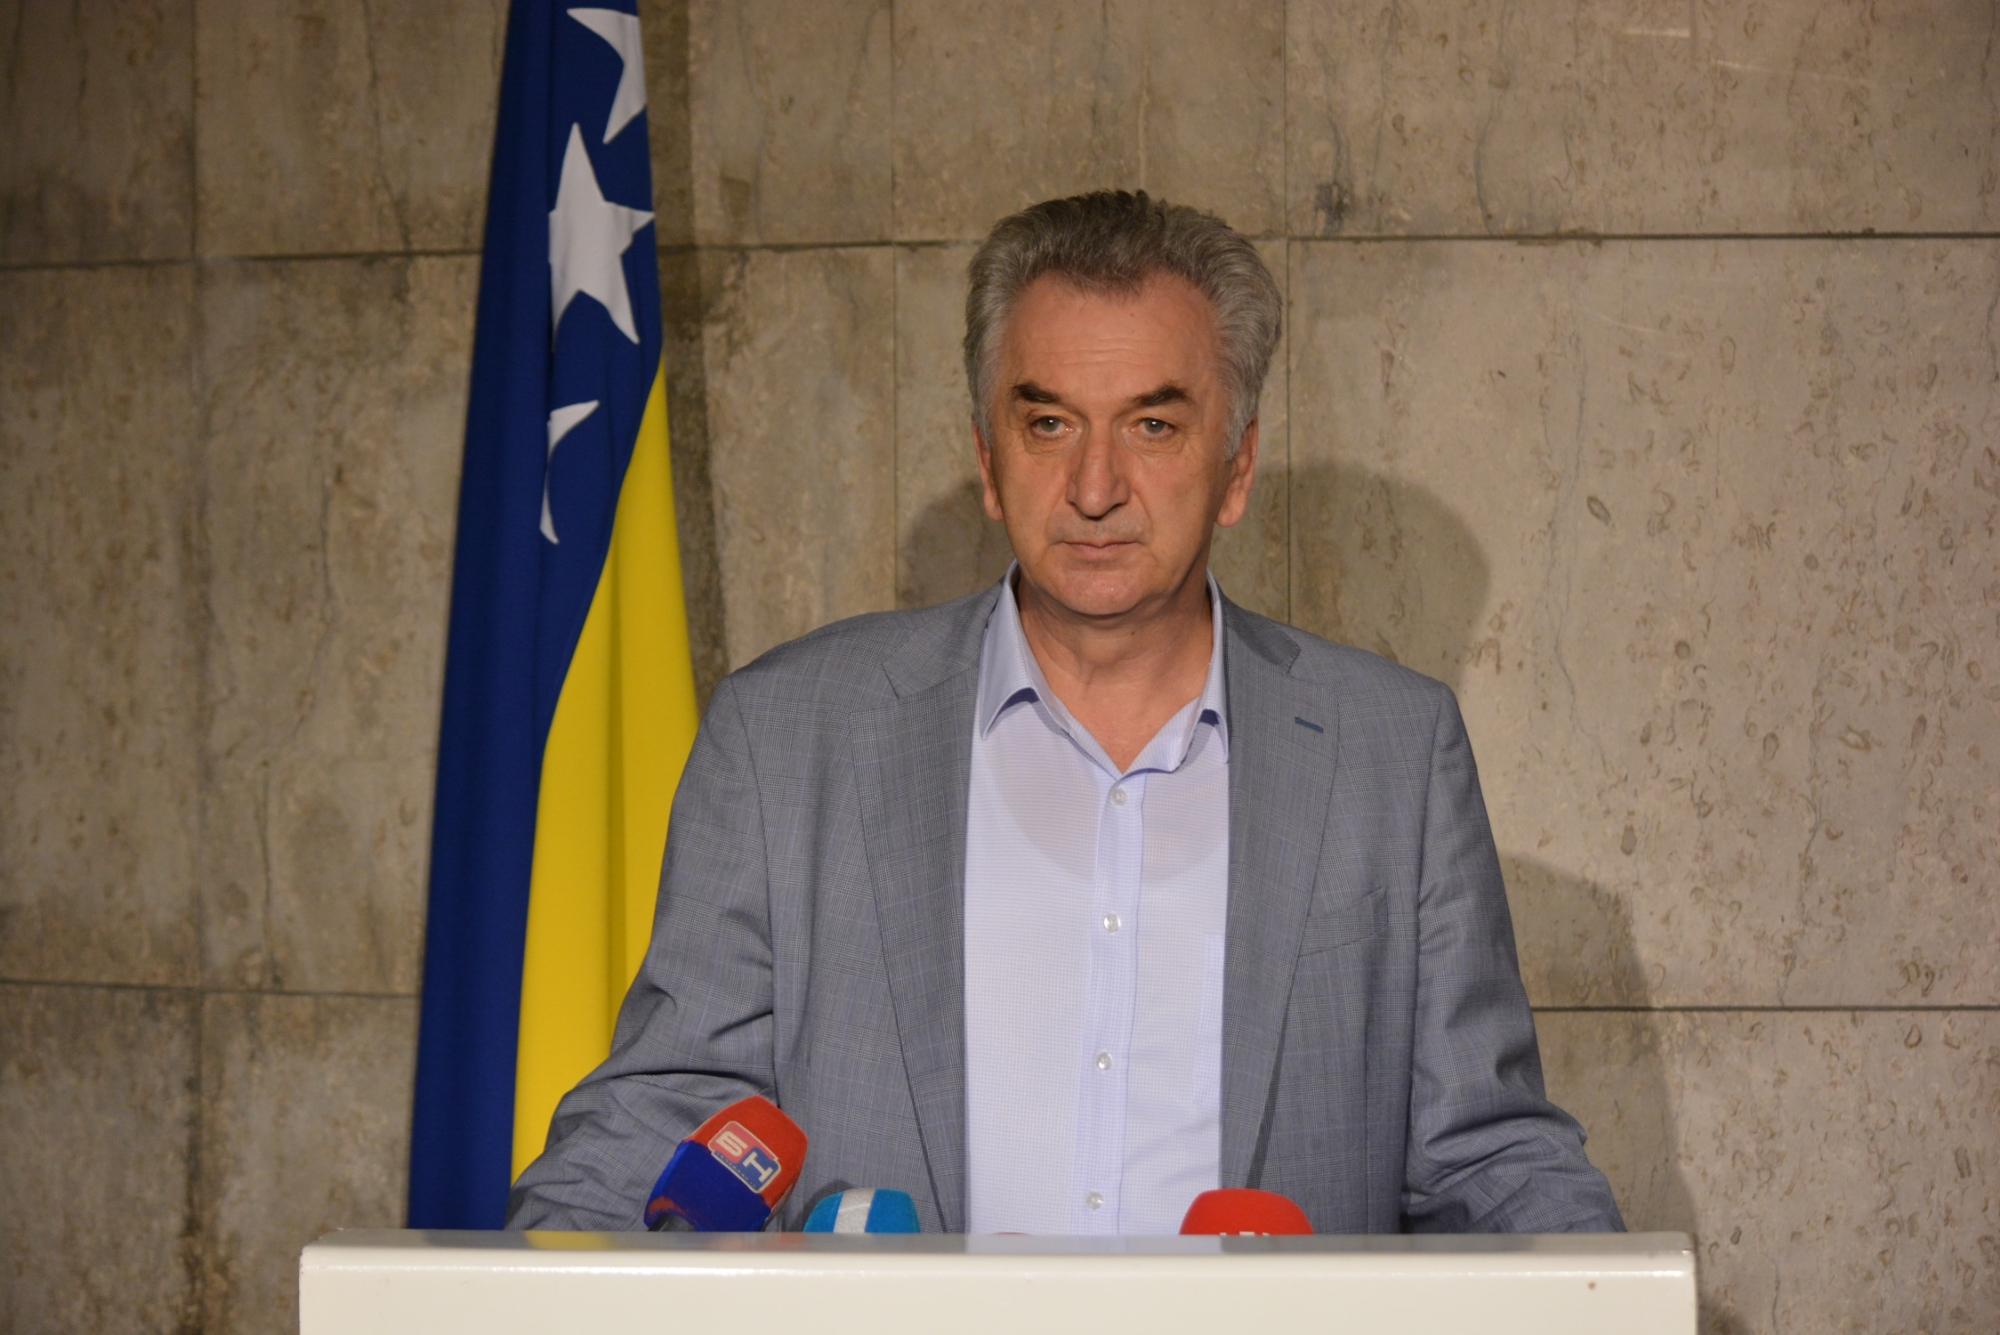 BiH negotiates with EU to adjust SAA